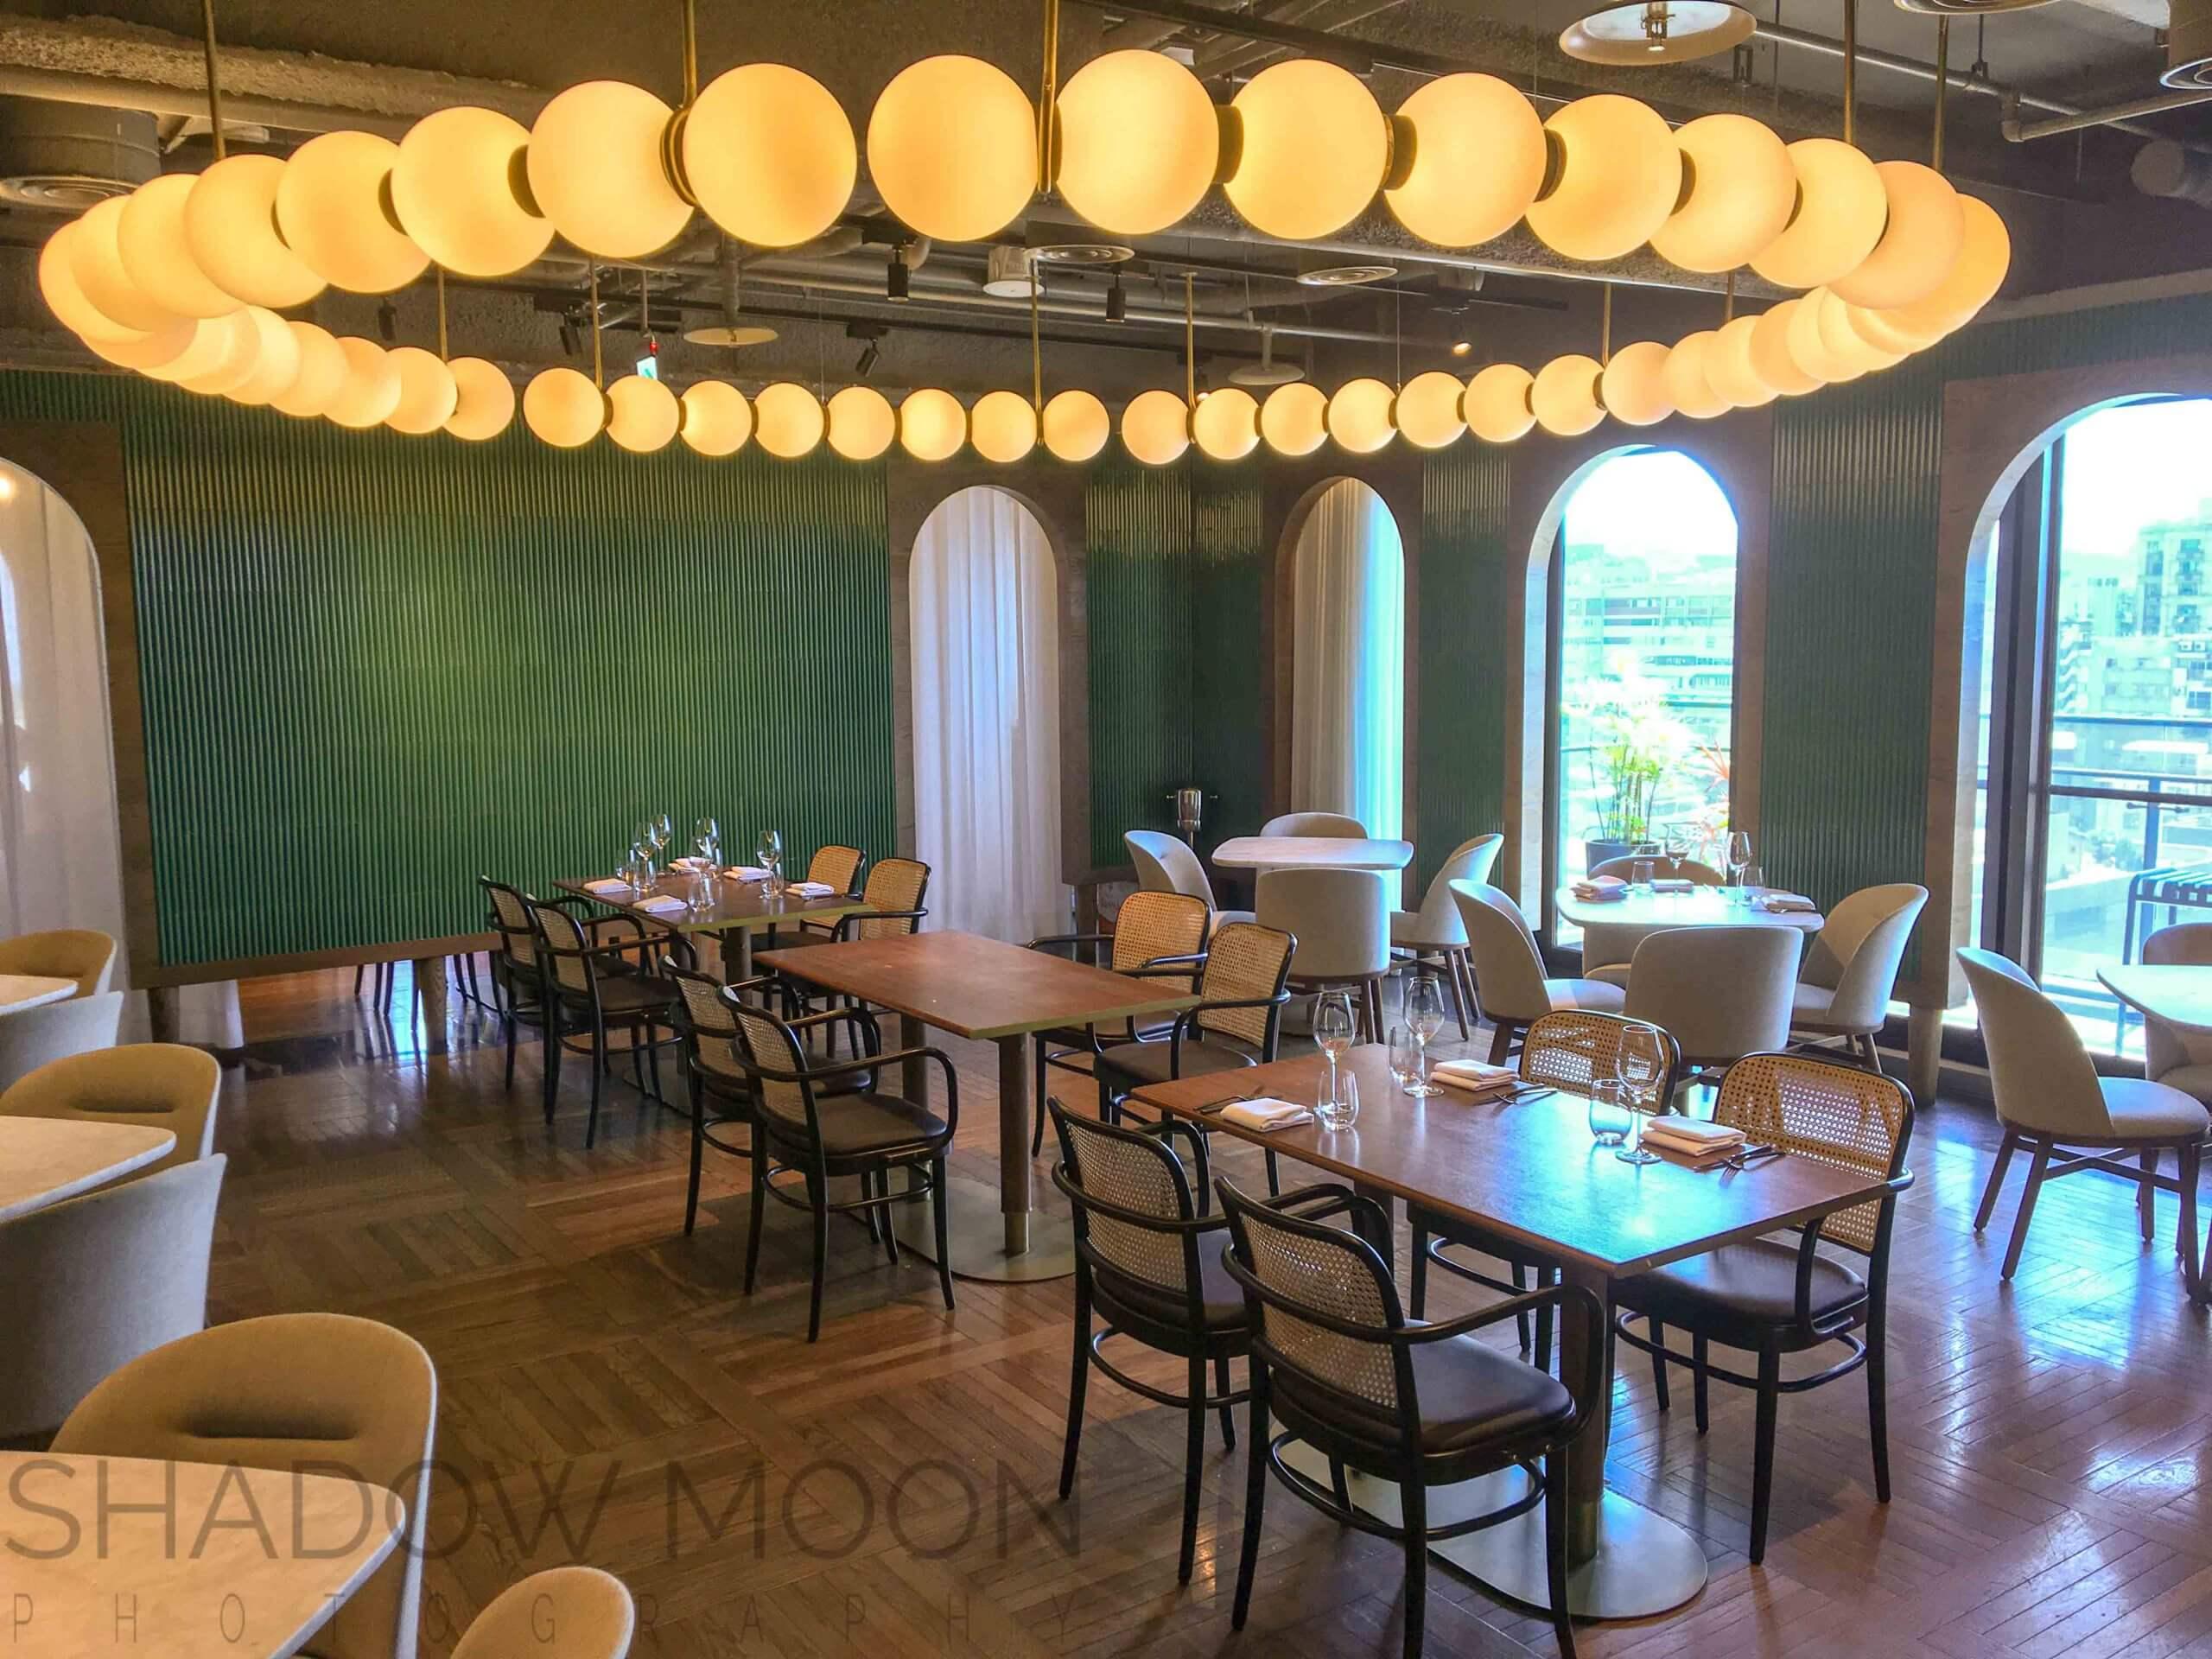 tavernist, 金普頓, 台北tavernist, tavernist早餐, shadowmoon, shadowmoon vr, 影月, 影月vr, 影月虛擬實境製作, 影月shadowmoon vr